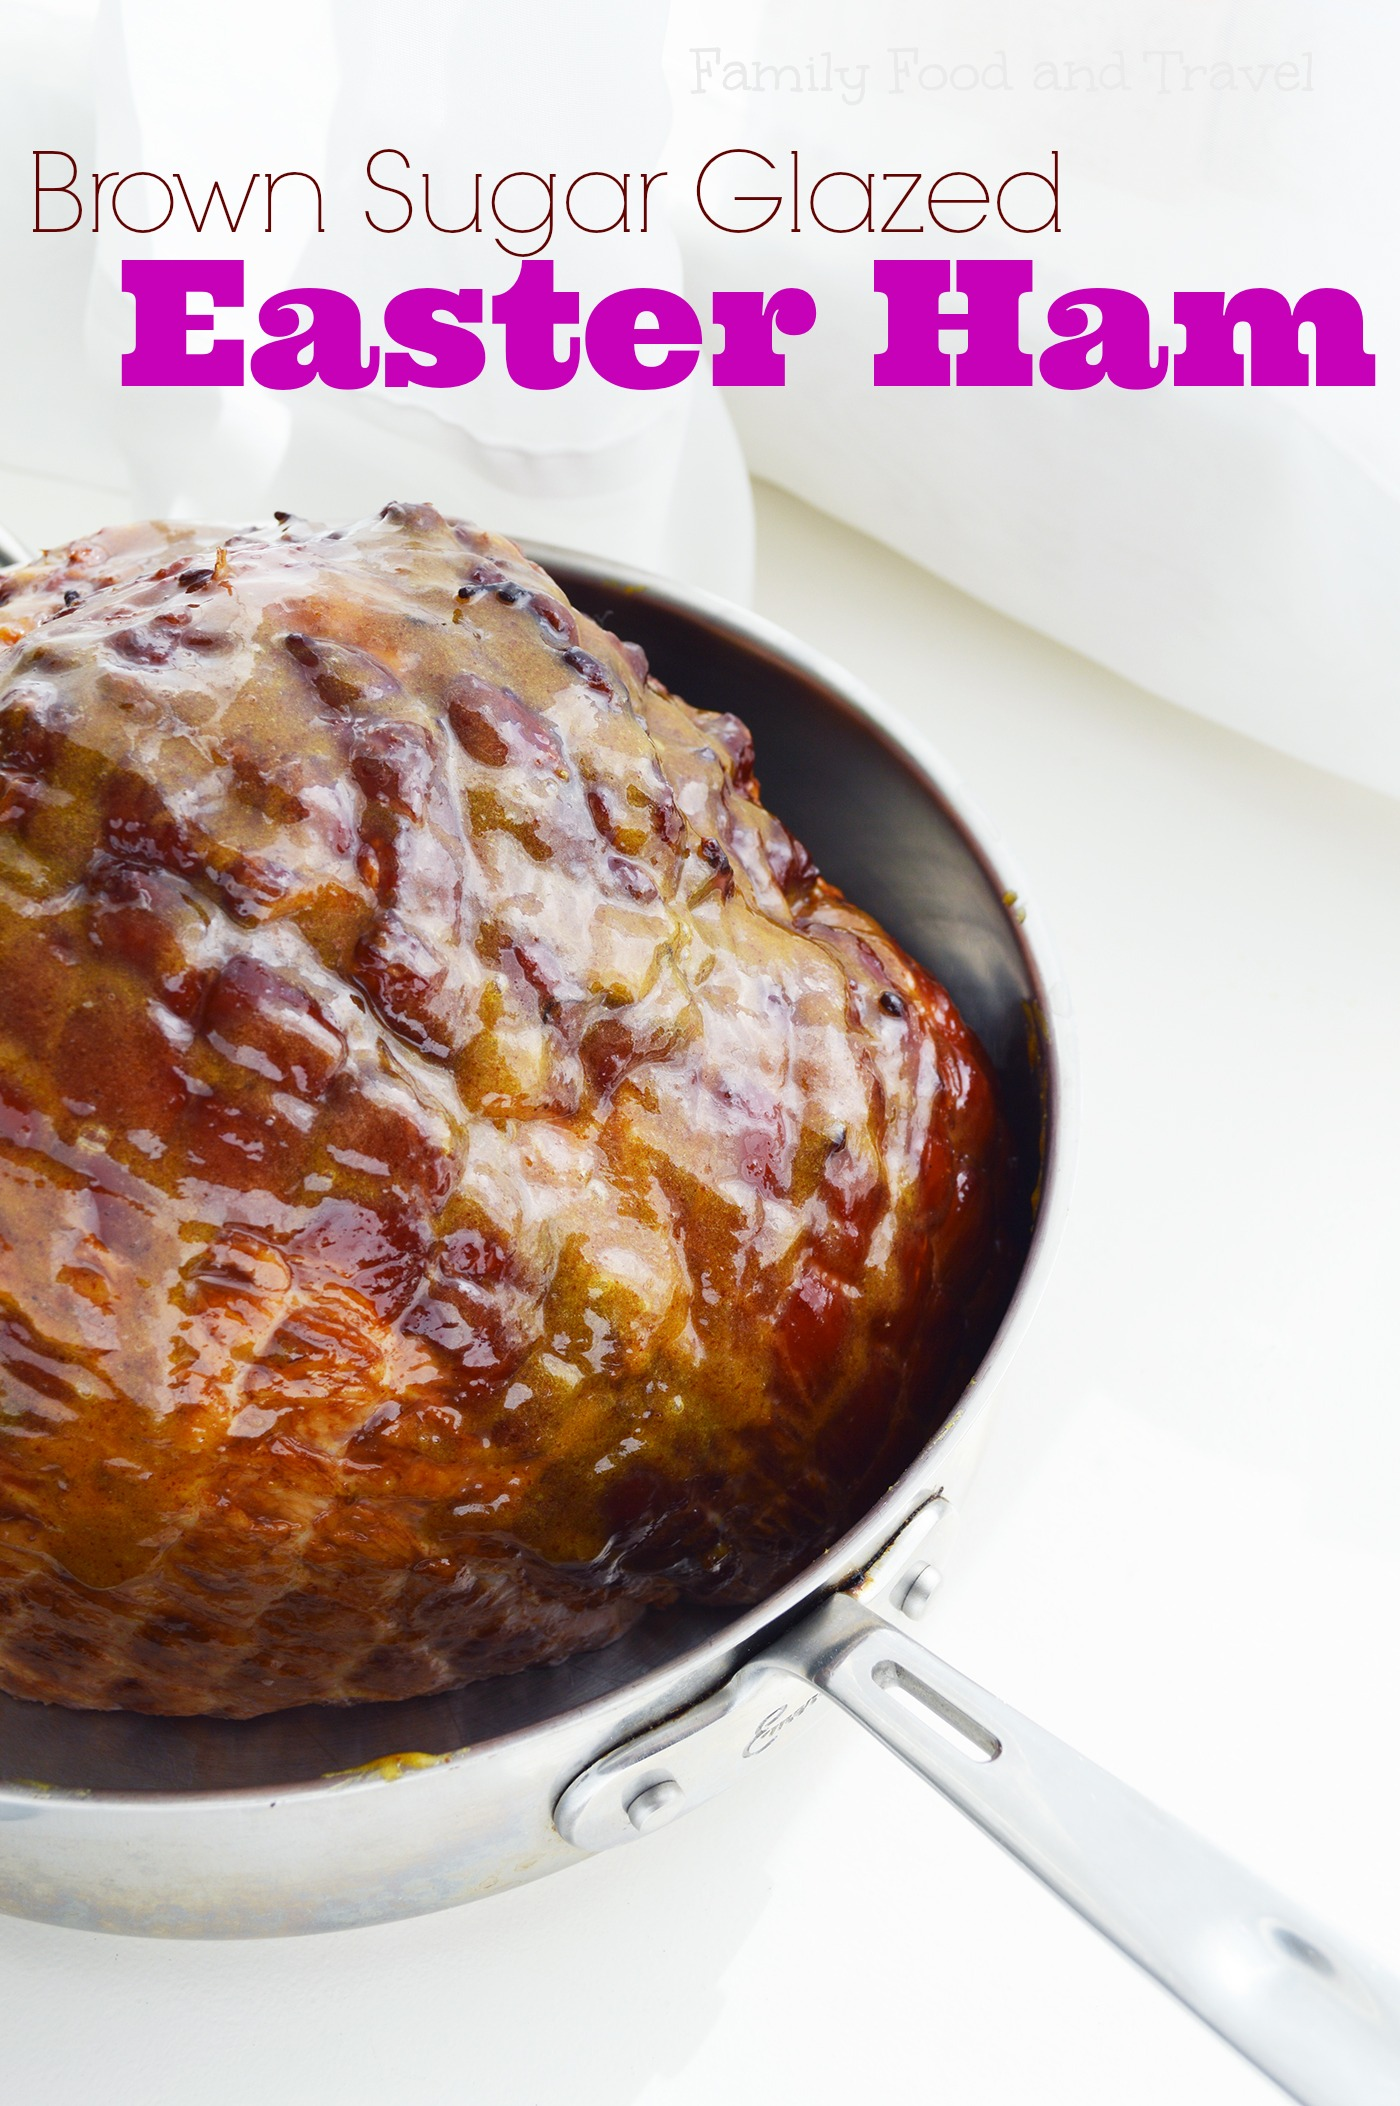 Brown-Sugar-Glazed-Easter-Ham-.jpg